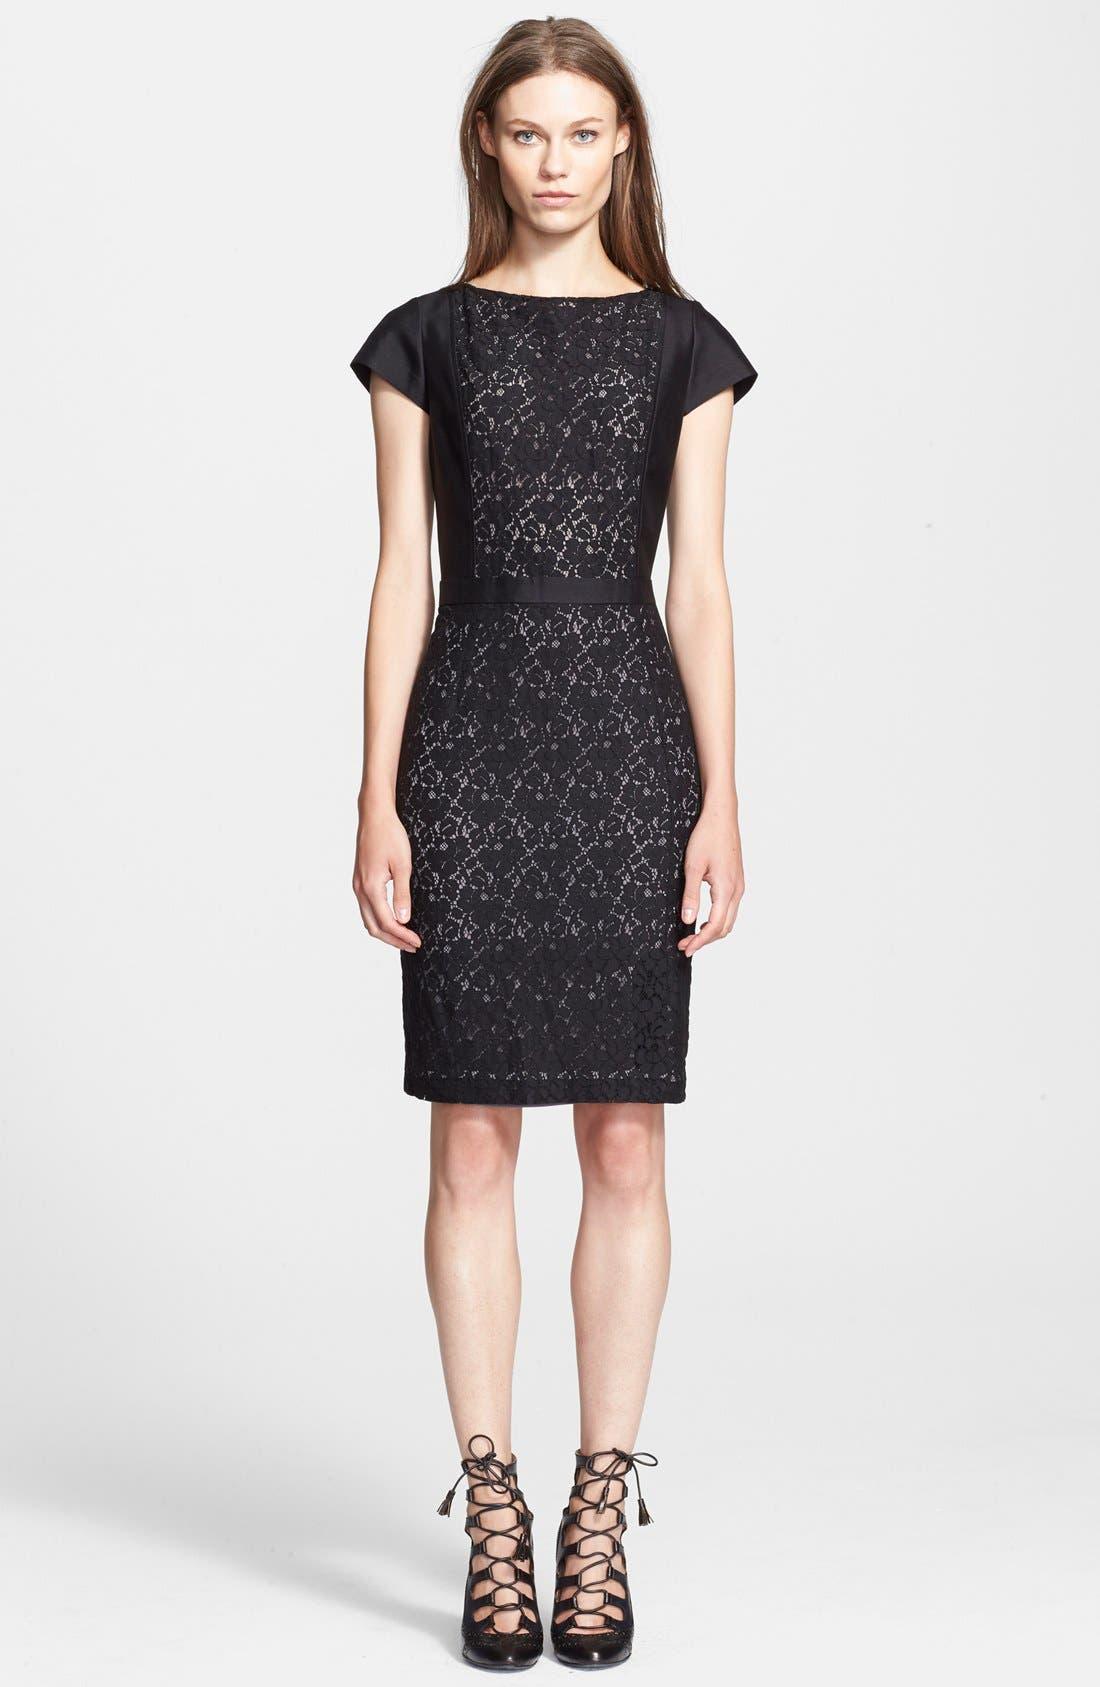 Alternate Image 1 Selected - Tory Burch 'Mariana' Dress